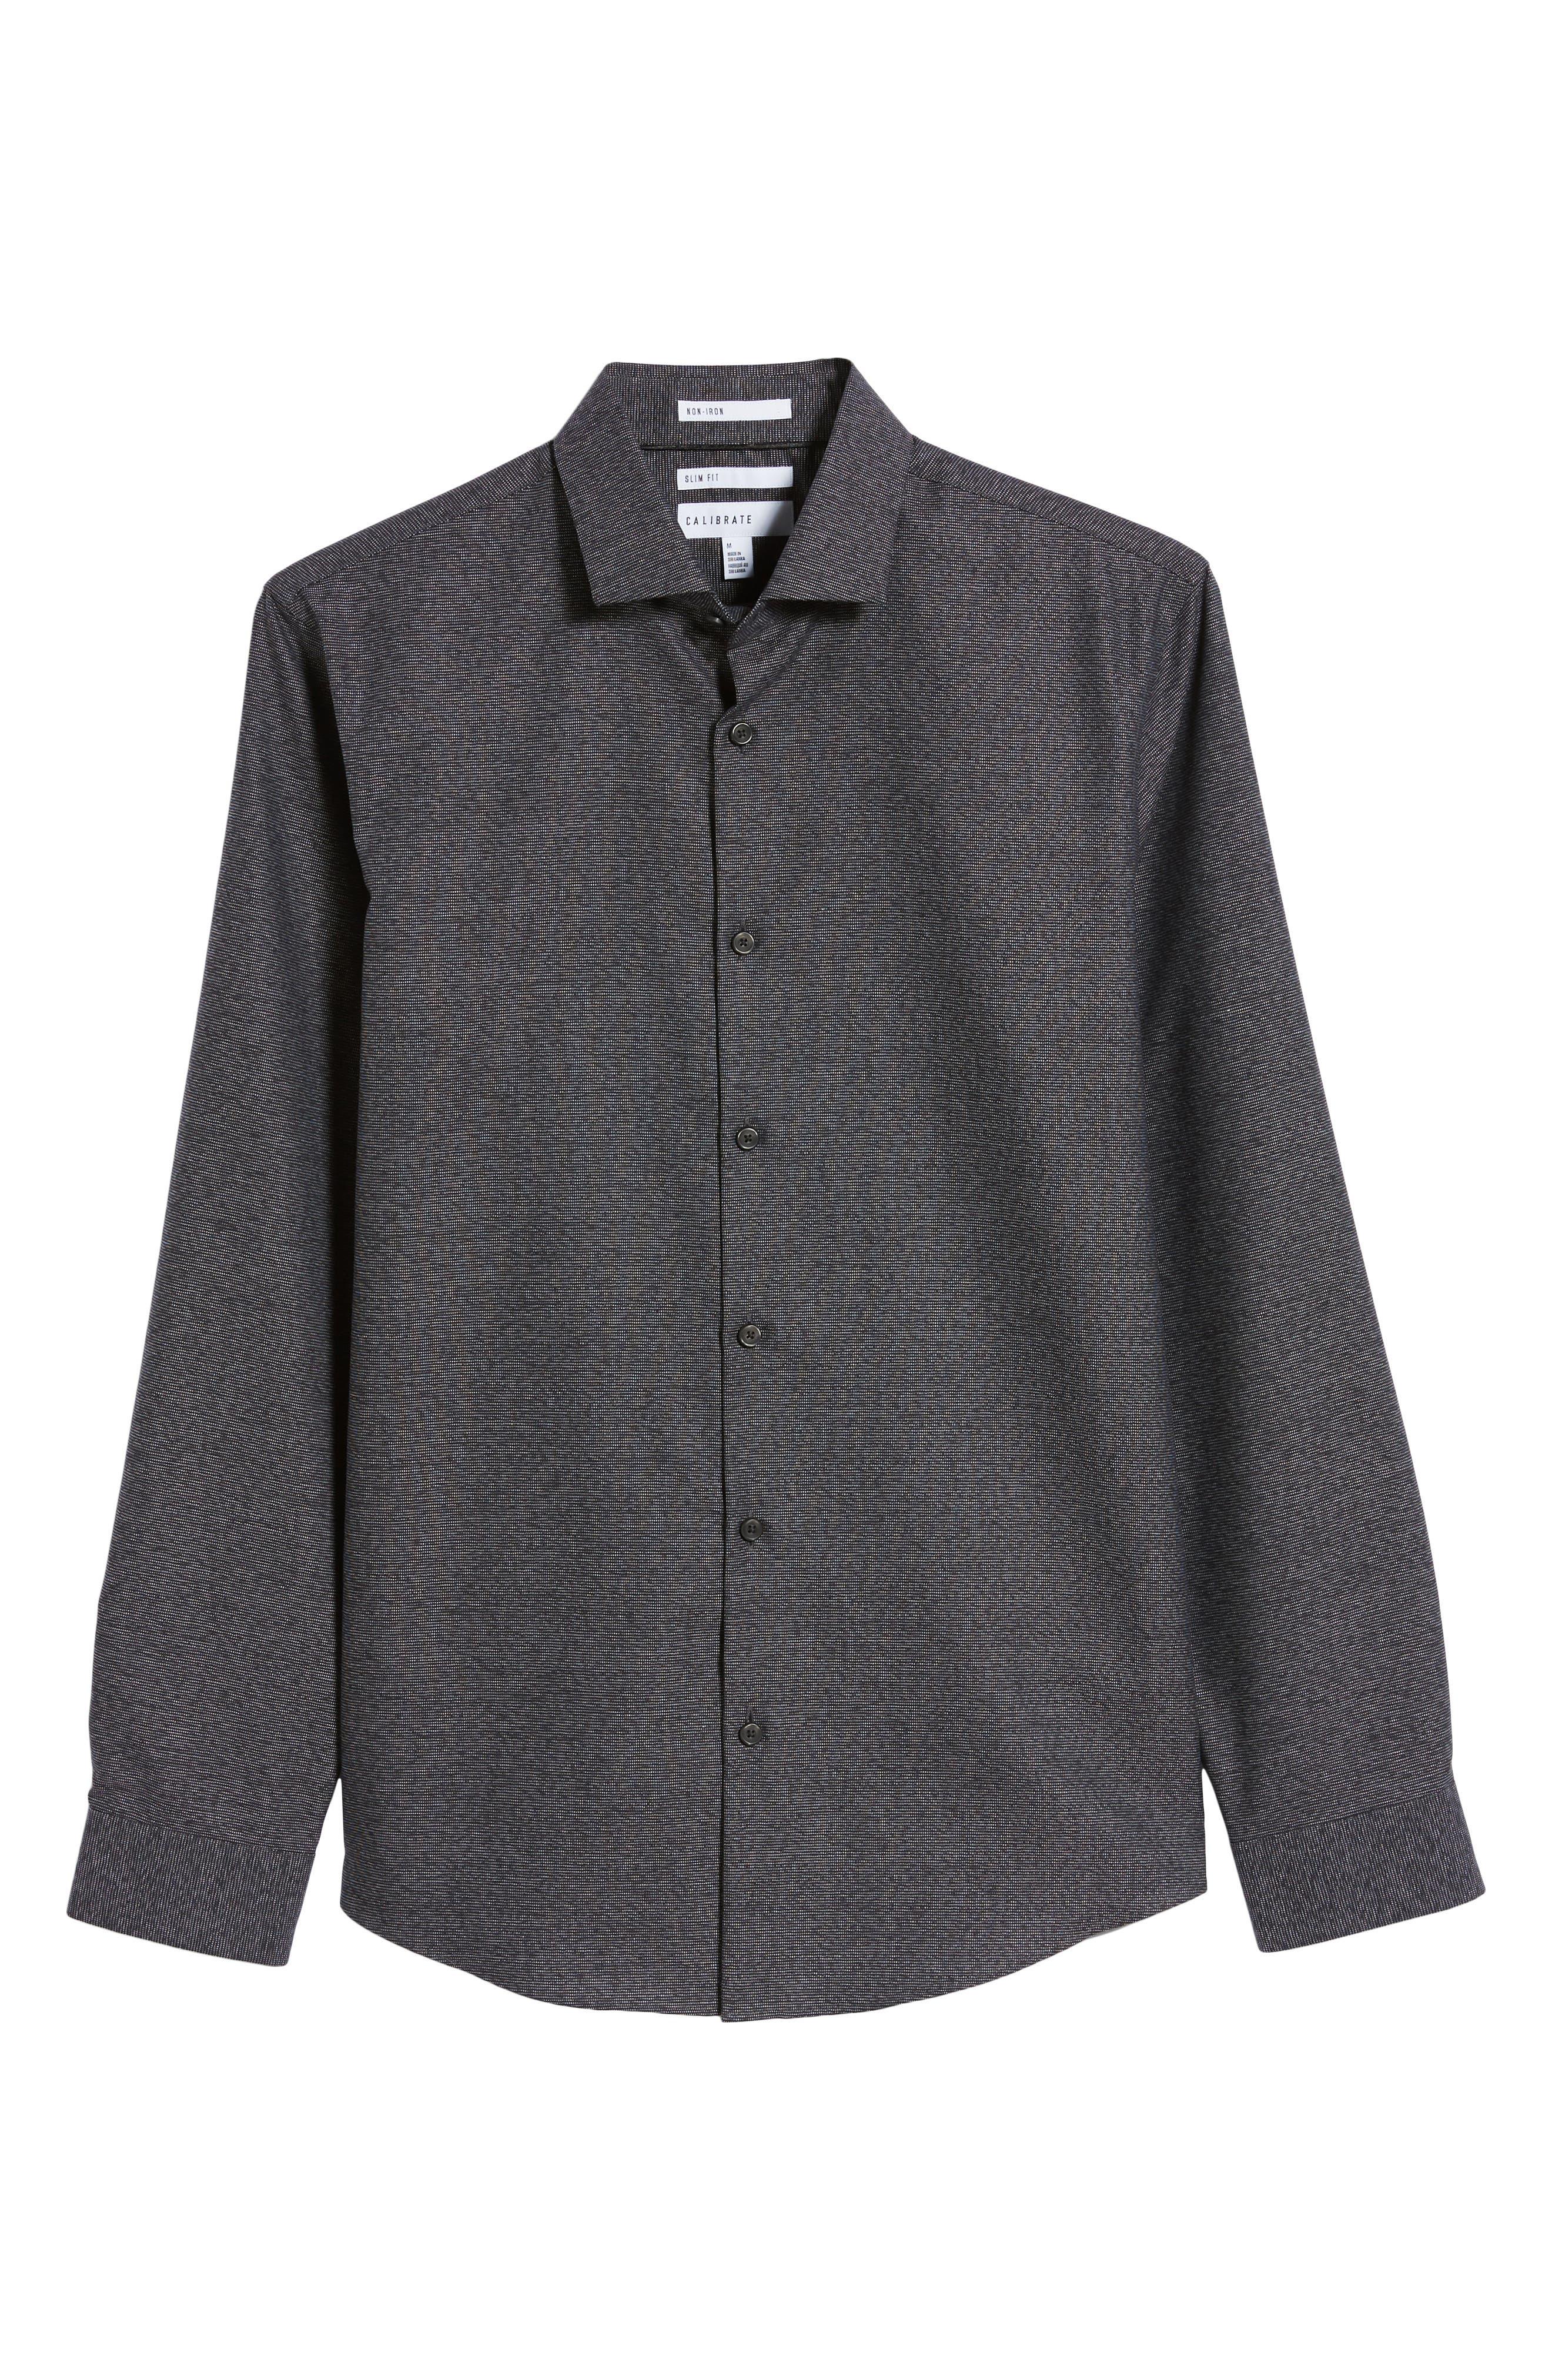 CALIBRATE,                             Slim Fit Non-Iron Textured Sport Shirt,                             Alternate thumbnail 5, color,                             001